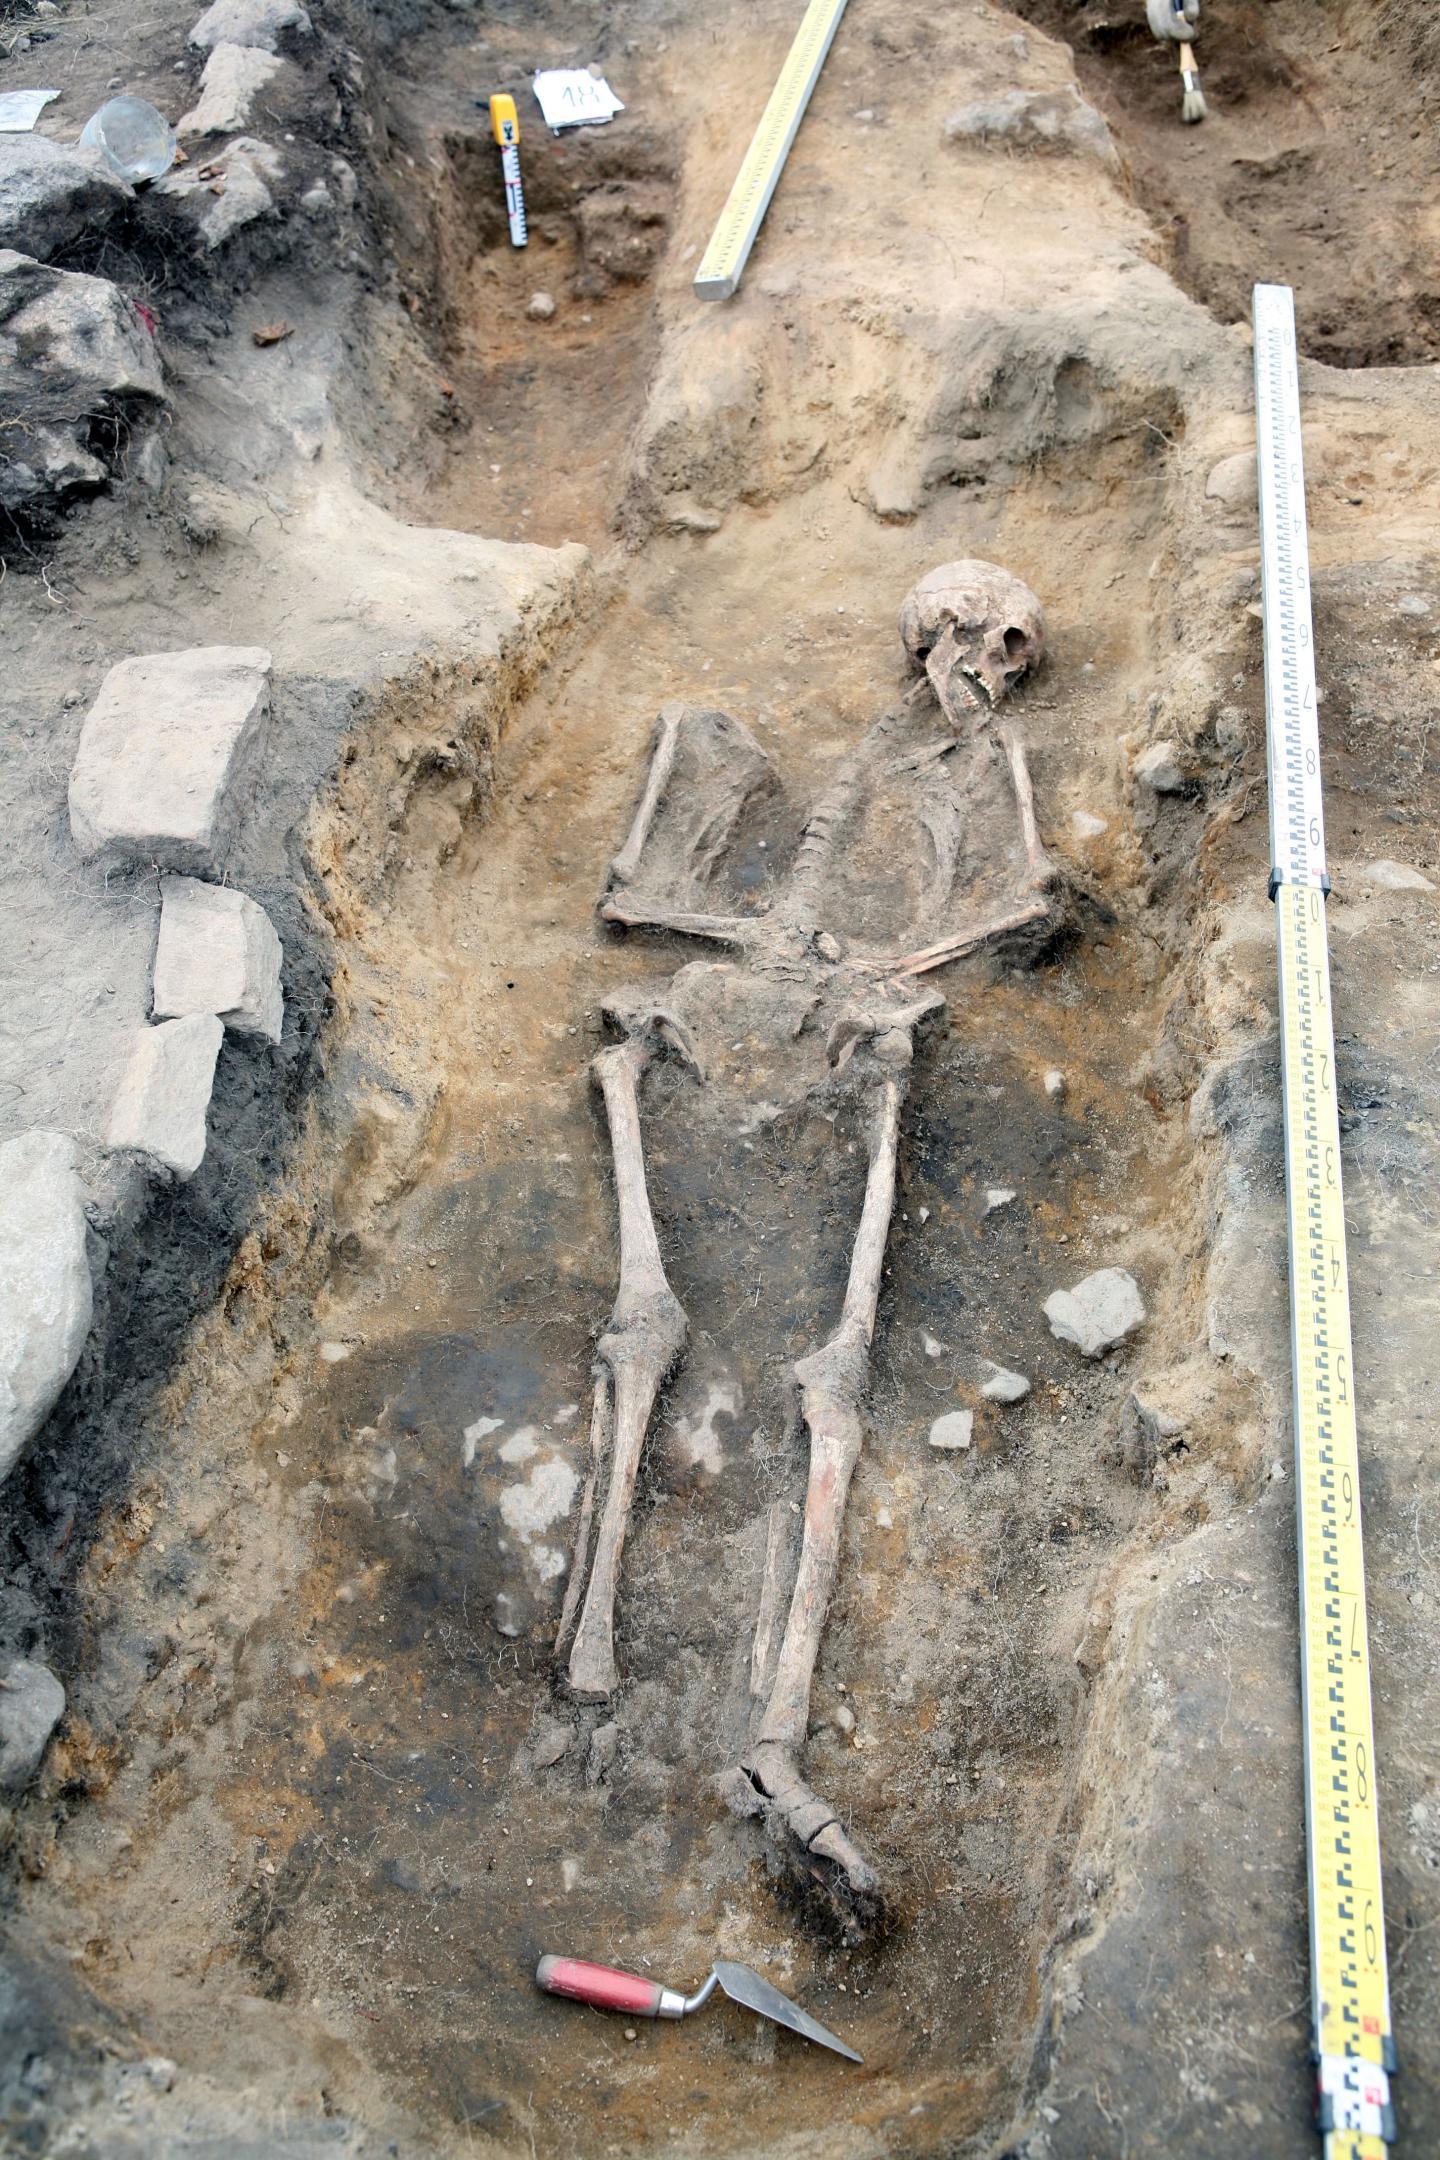 Medieval Burial Site of Kalmistomäki in Kylälahti, Hiitola in Russia